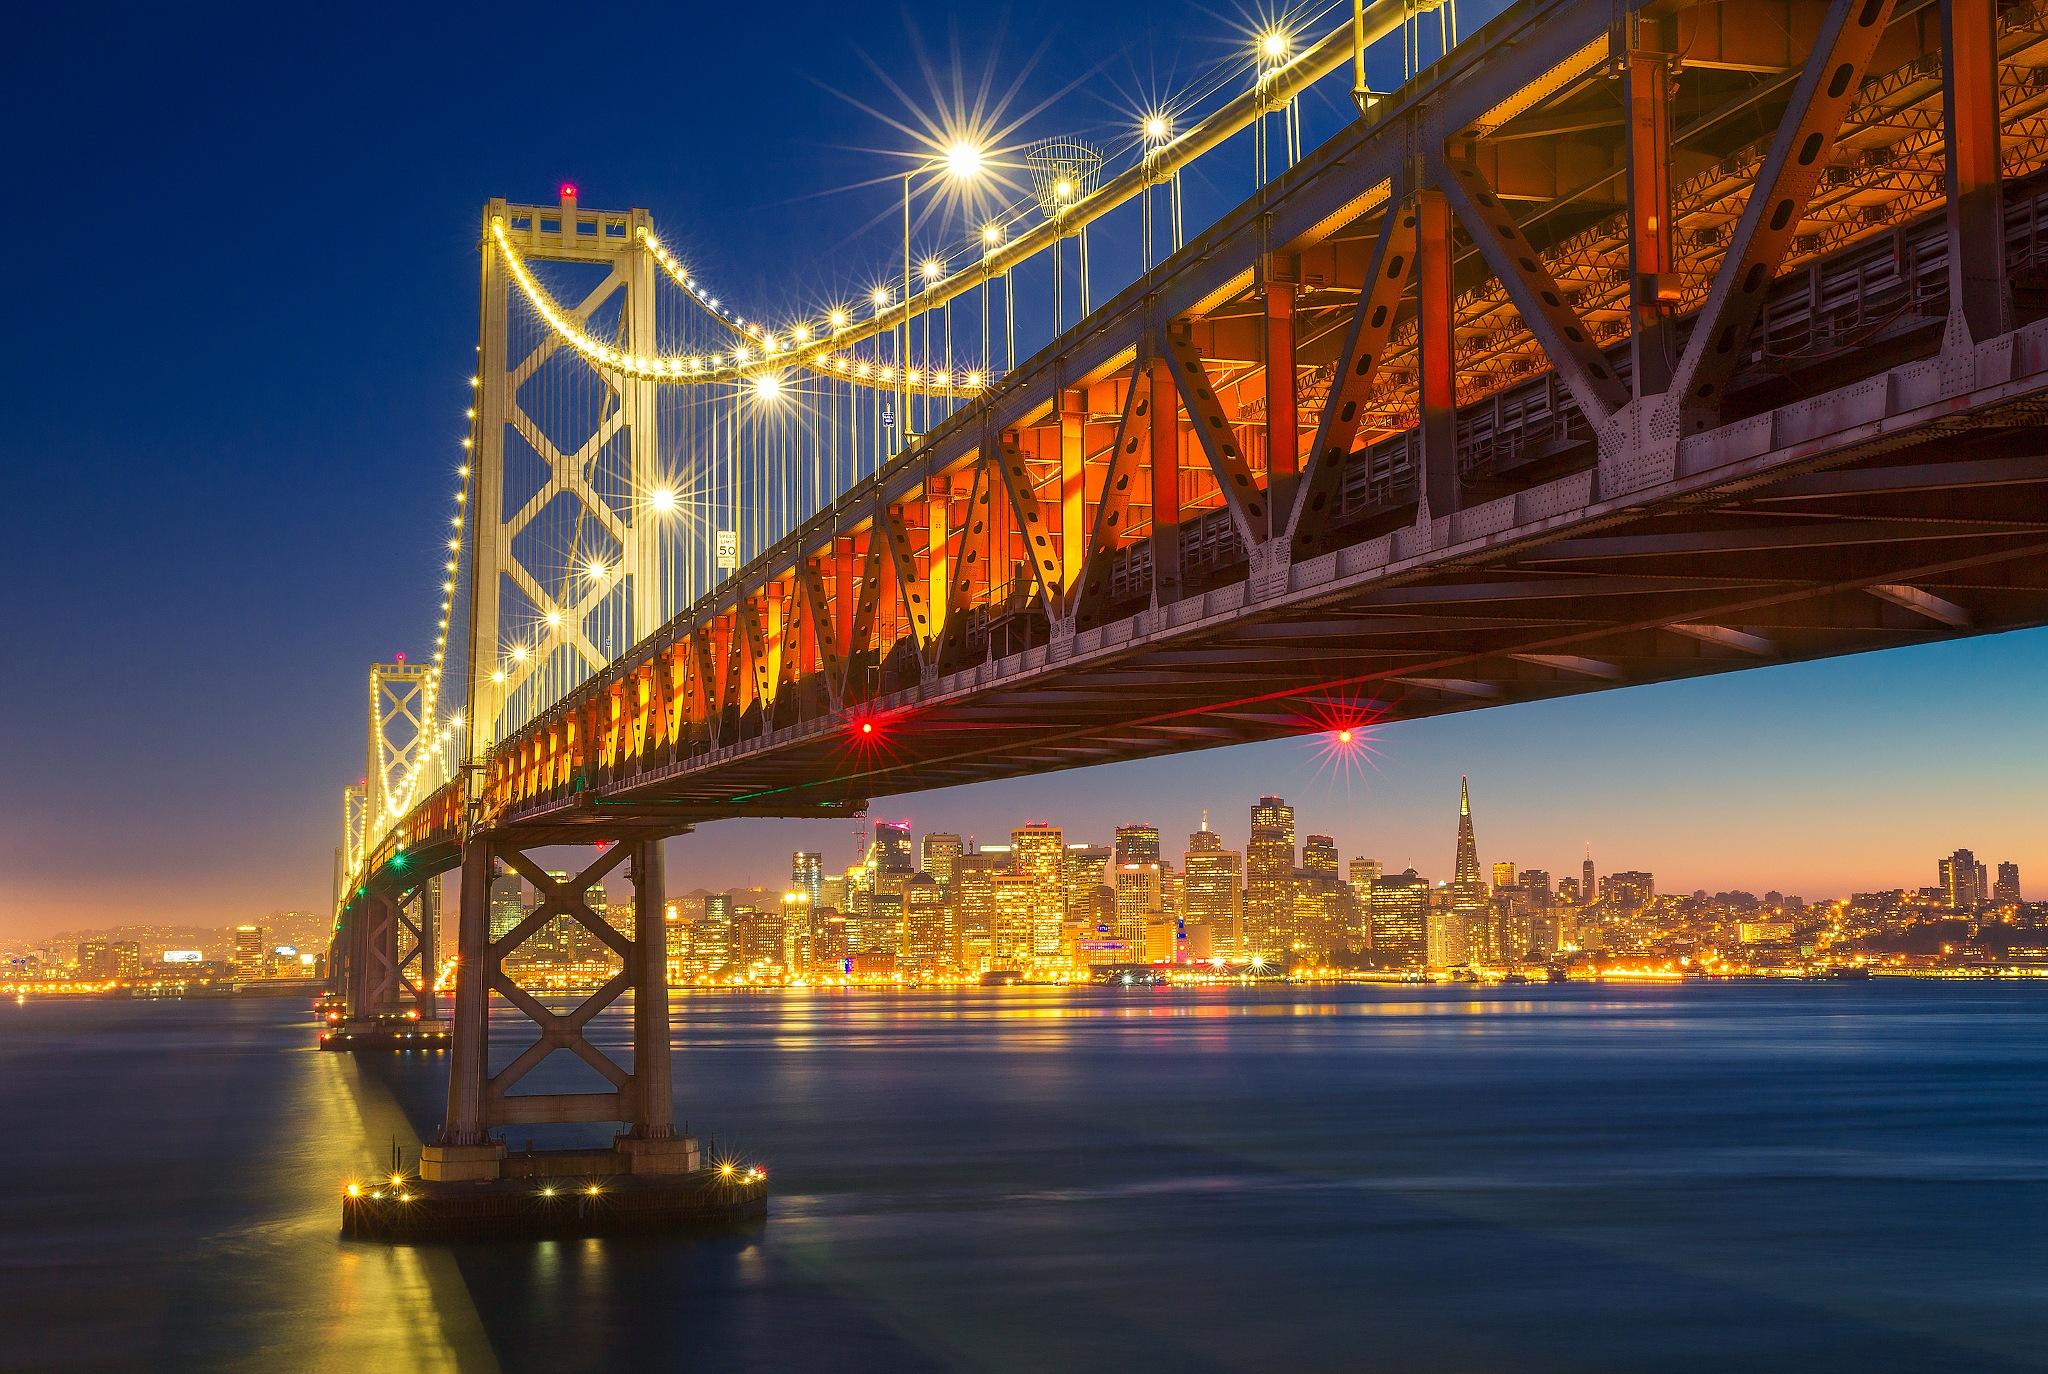 Via San Francisco by Dianachang